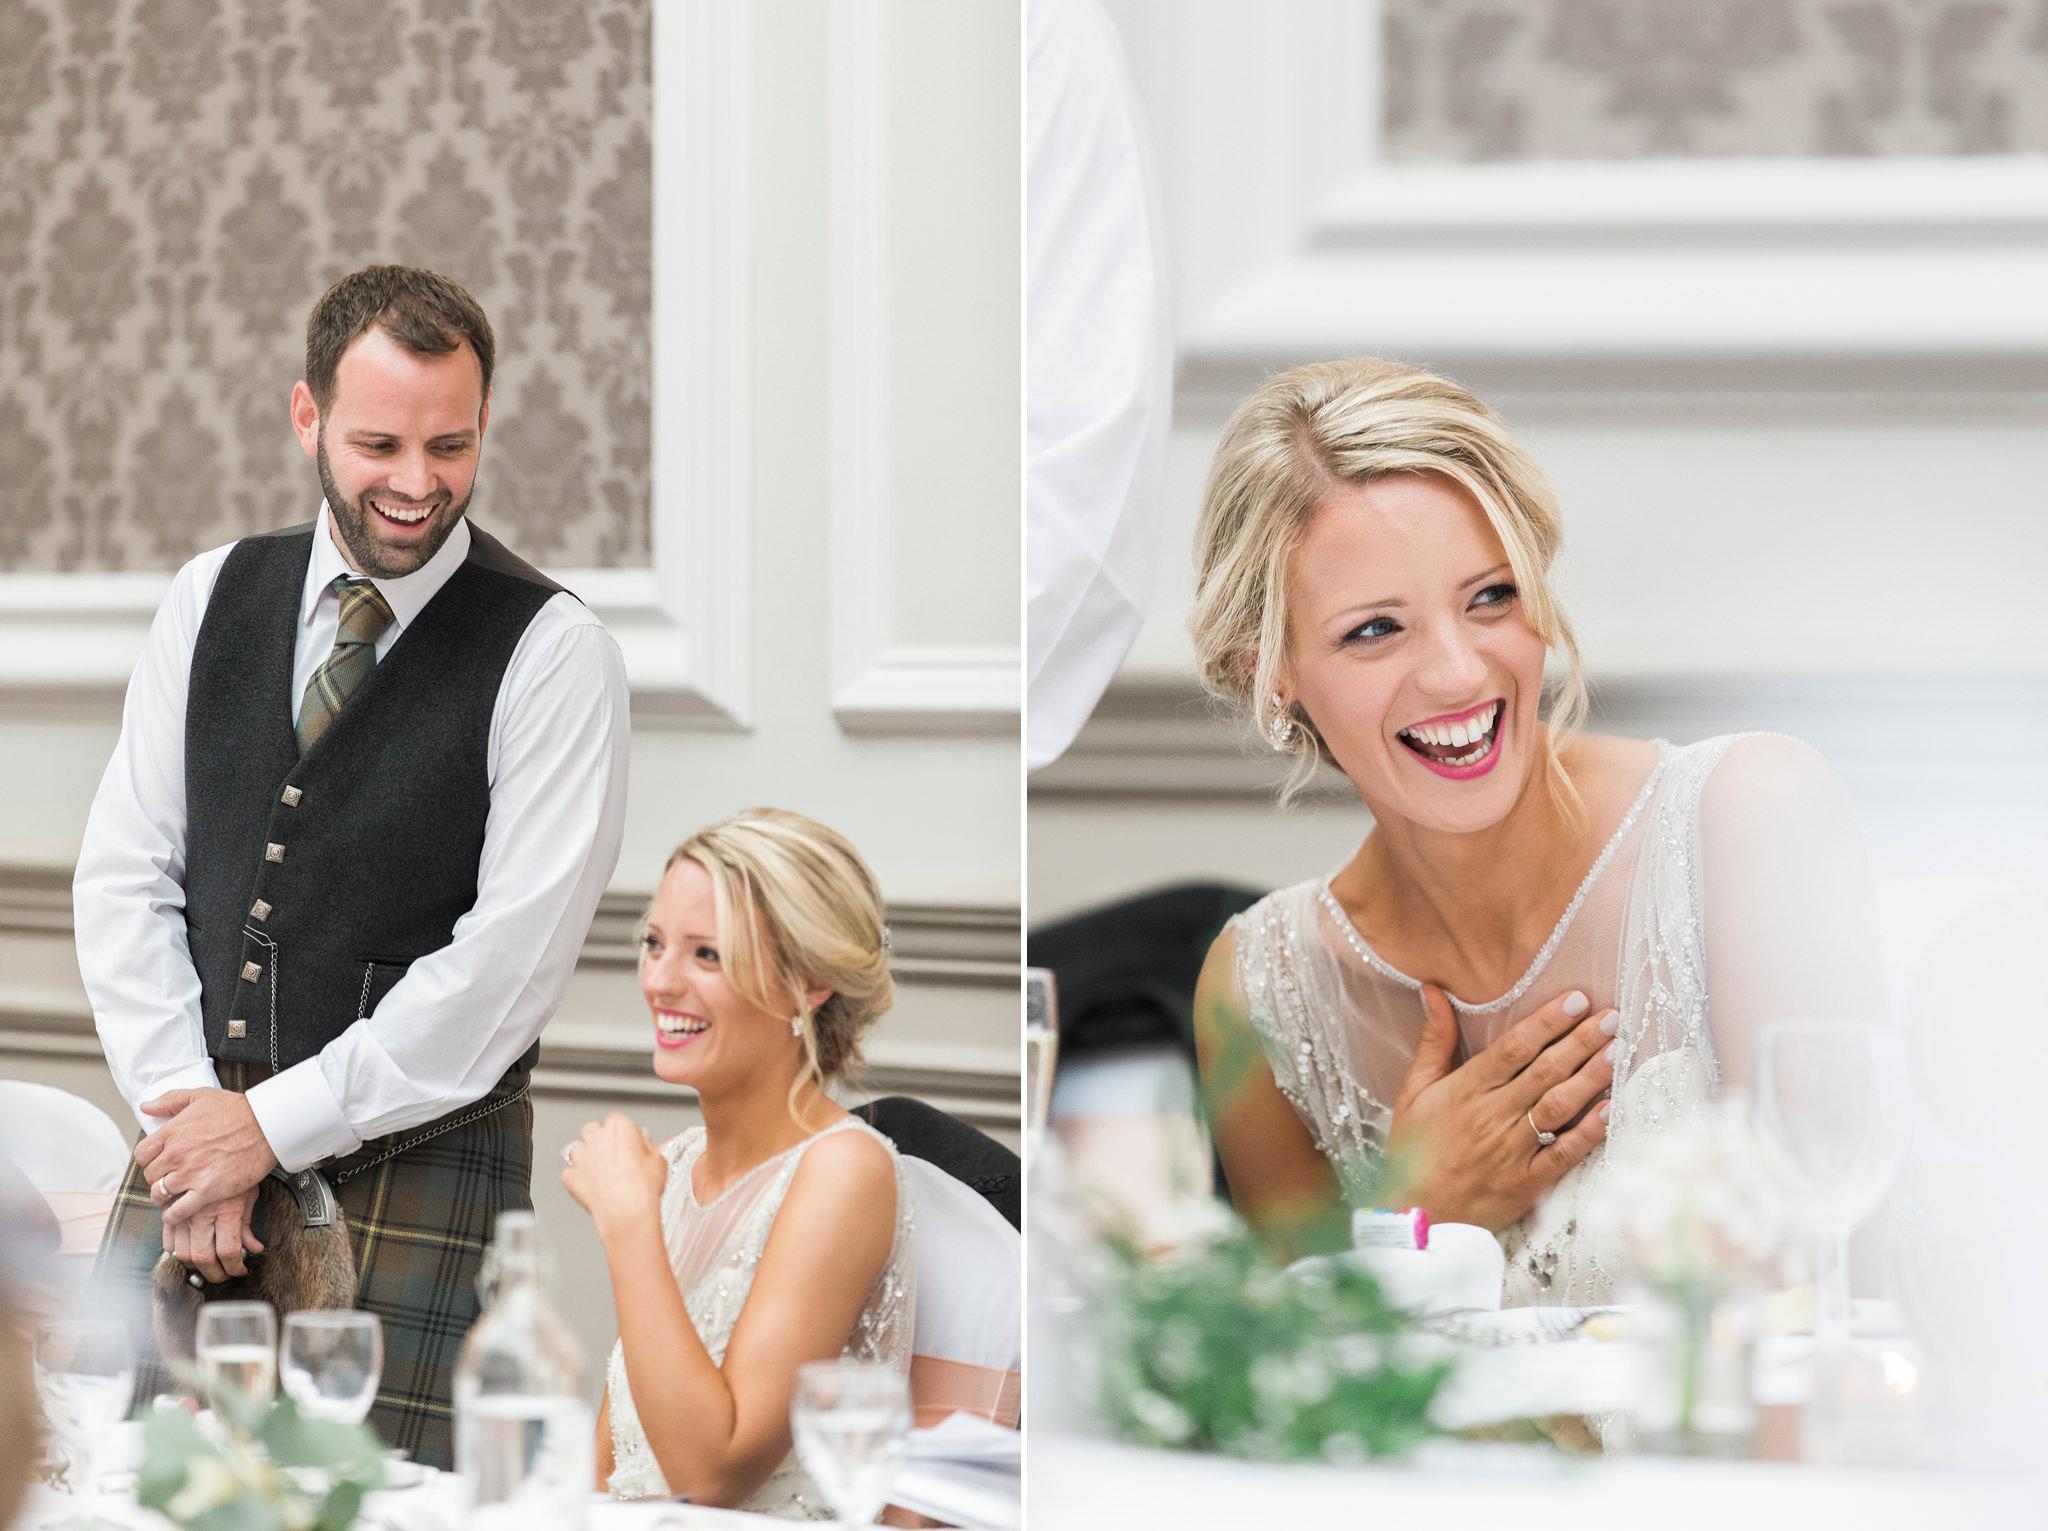 105-desination-wedding-photographer-scotland.jpg